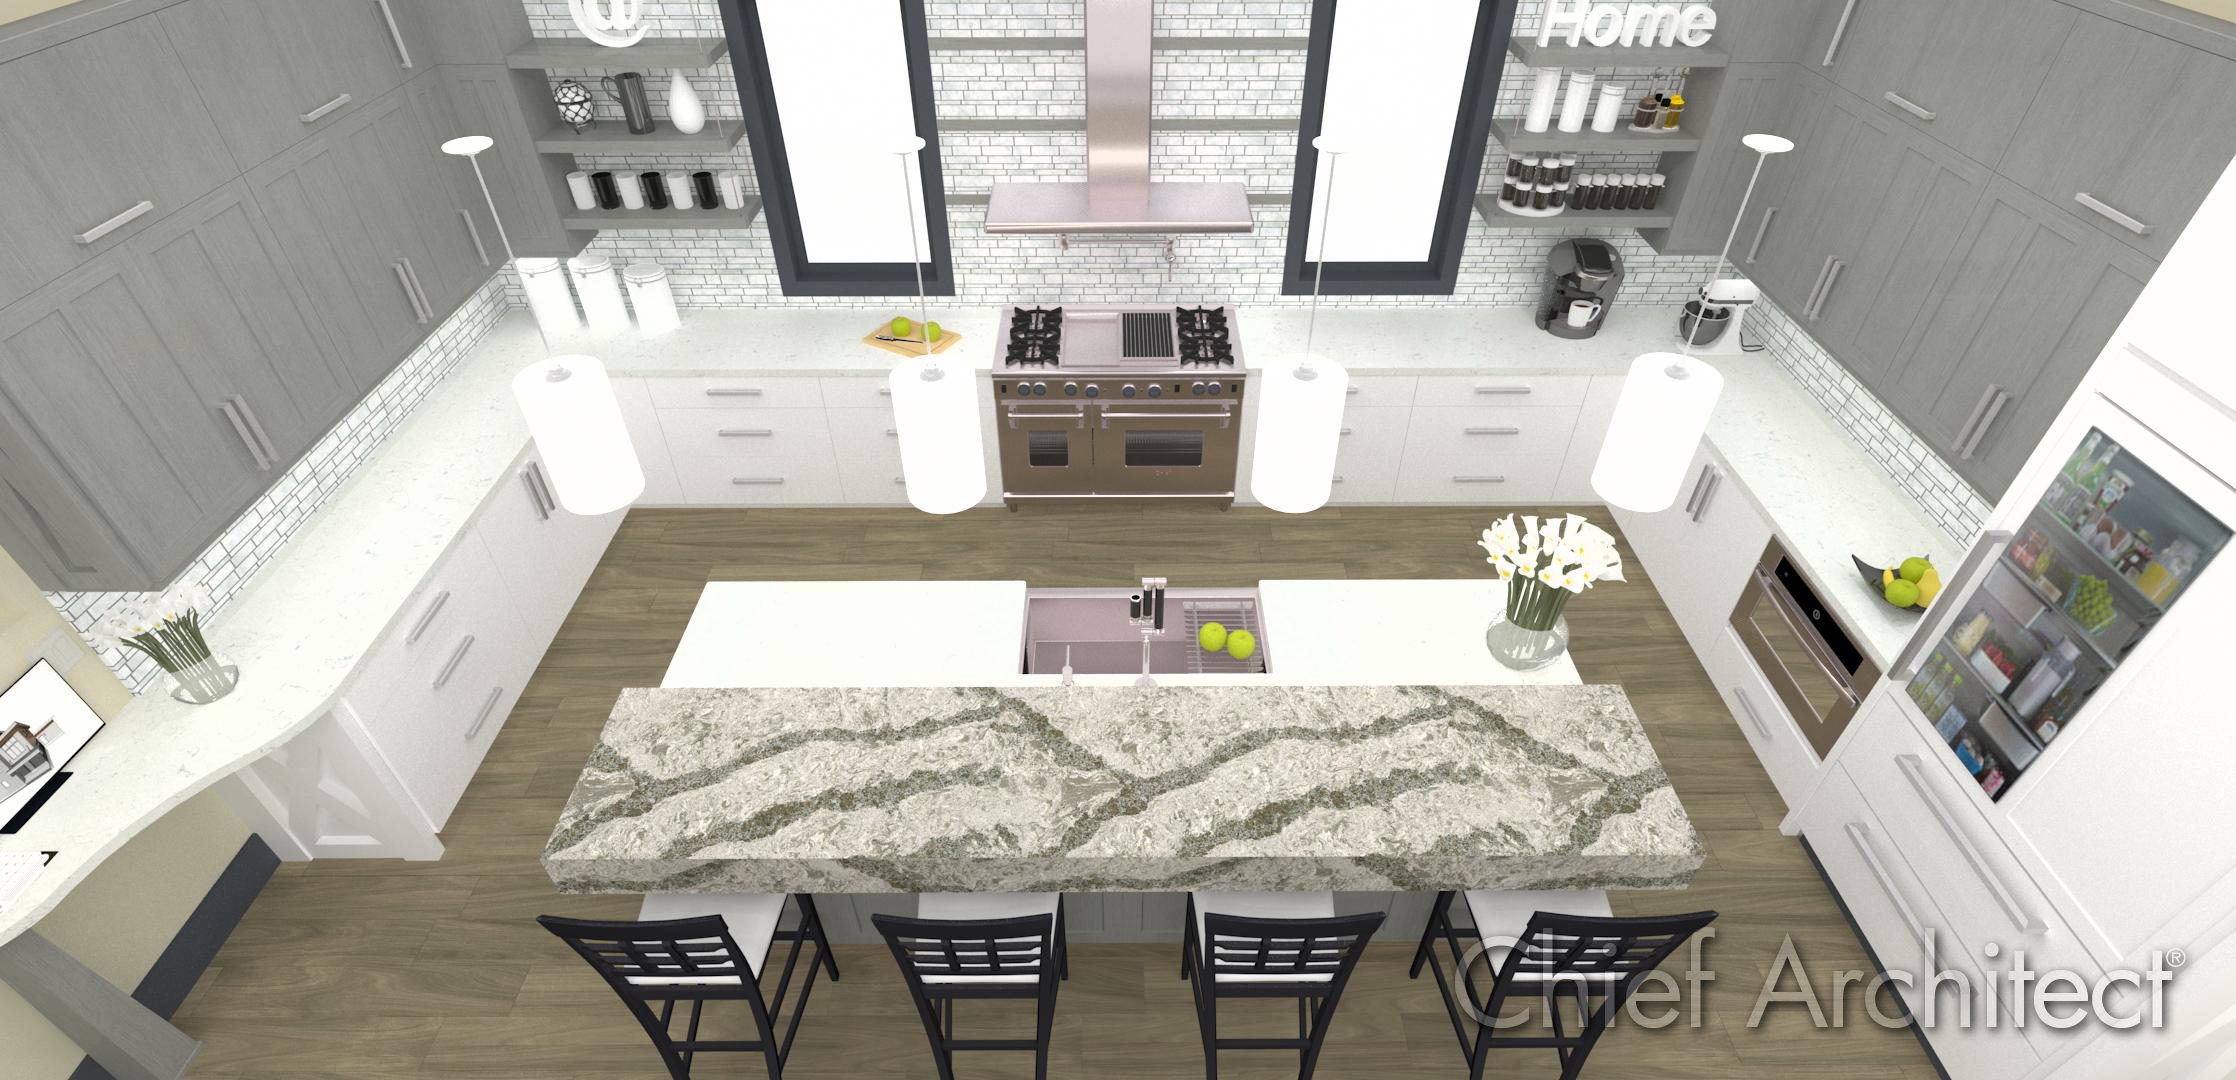 Chief Architect Announces New Software | Kitchen & Bath Business